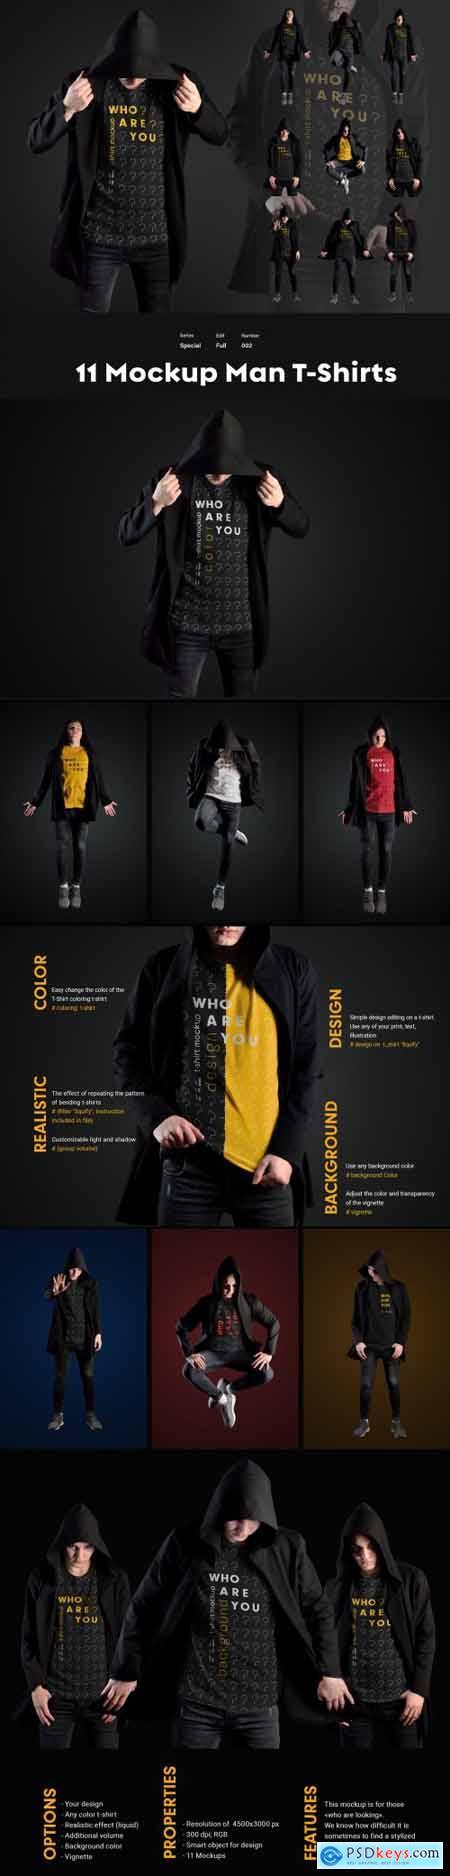 11 Mockups Man T-Shirts in a Black Hood Mantle